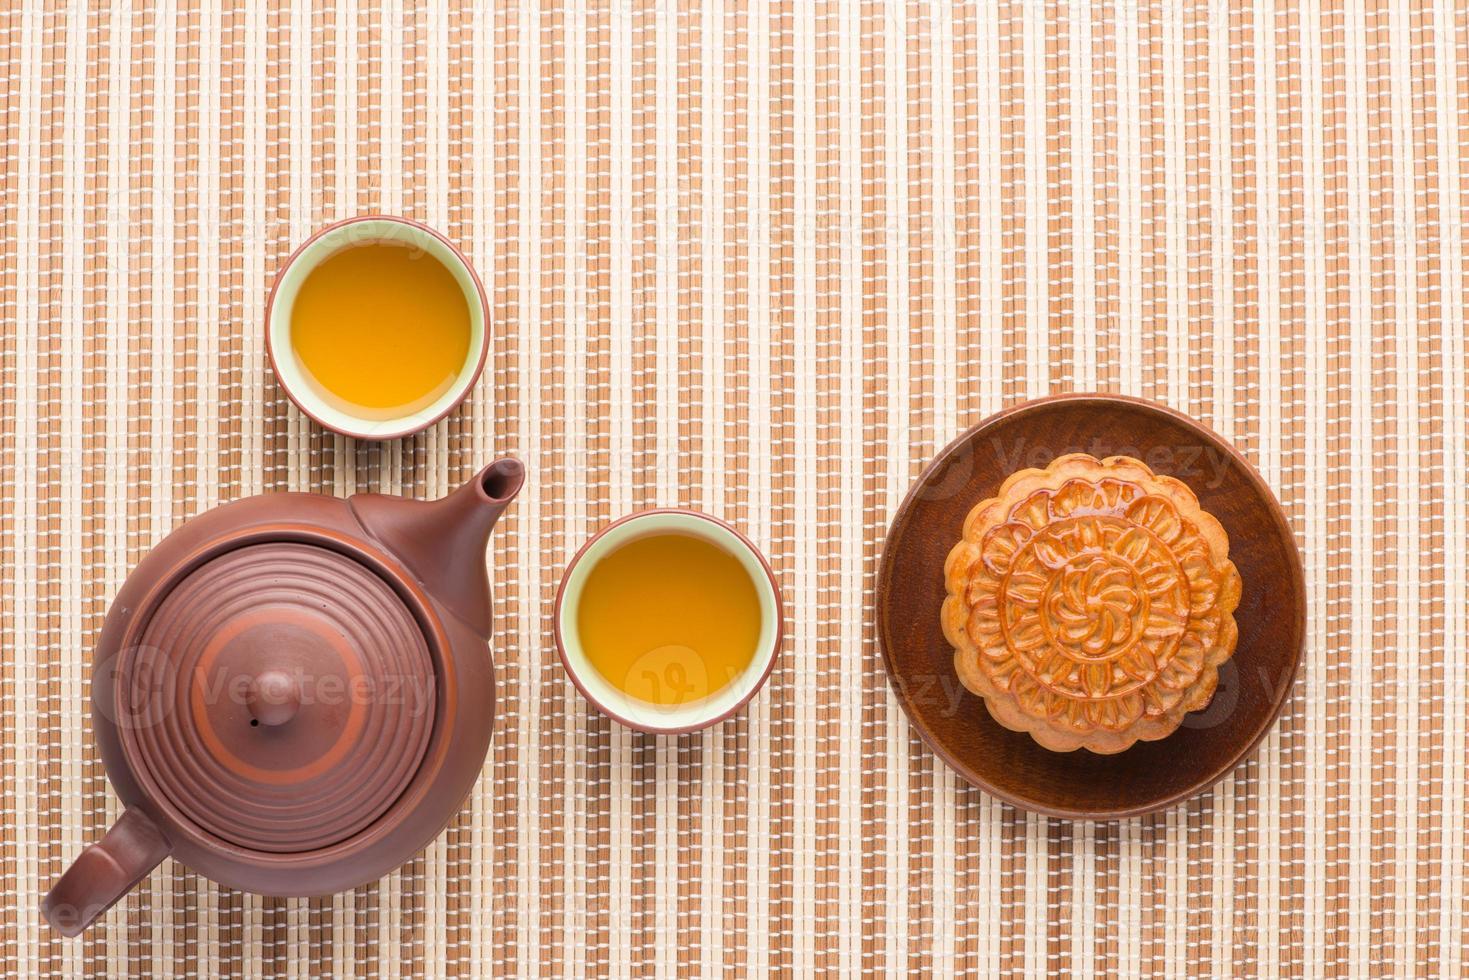 maancake en thee foto